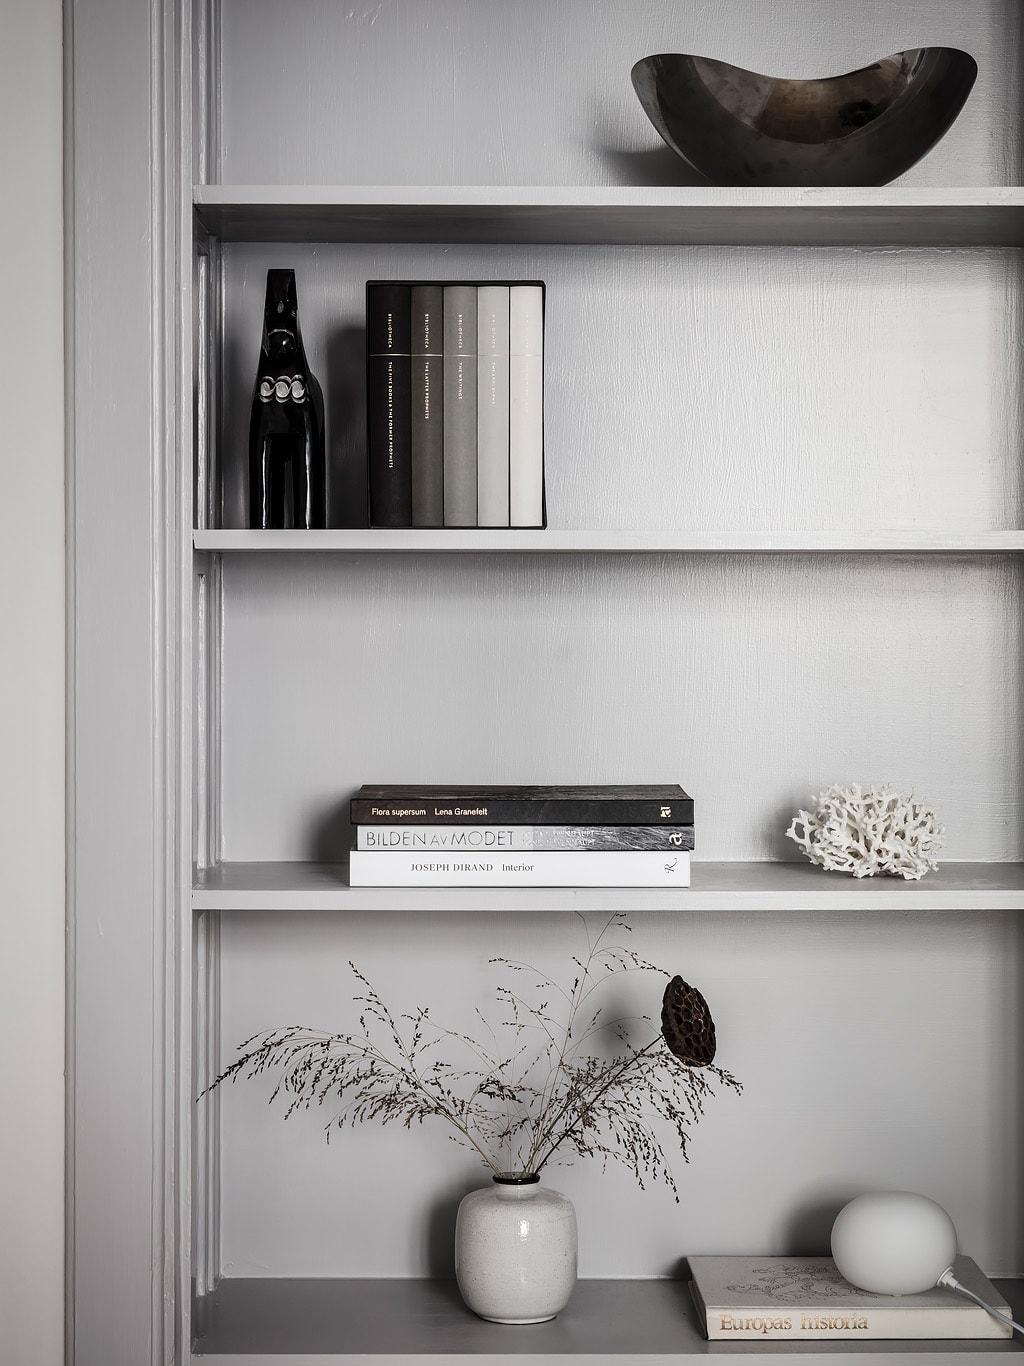 Cozy home with a blue kitchen - via Coco Lapine Design blog